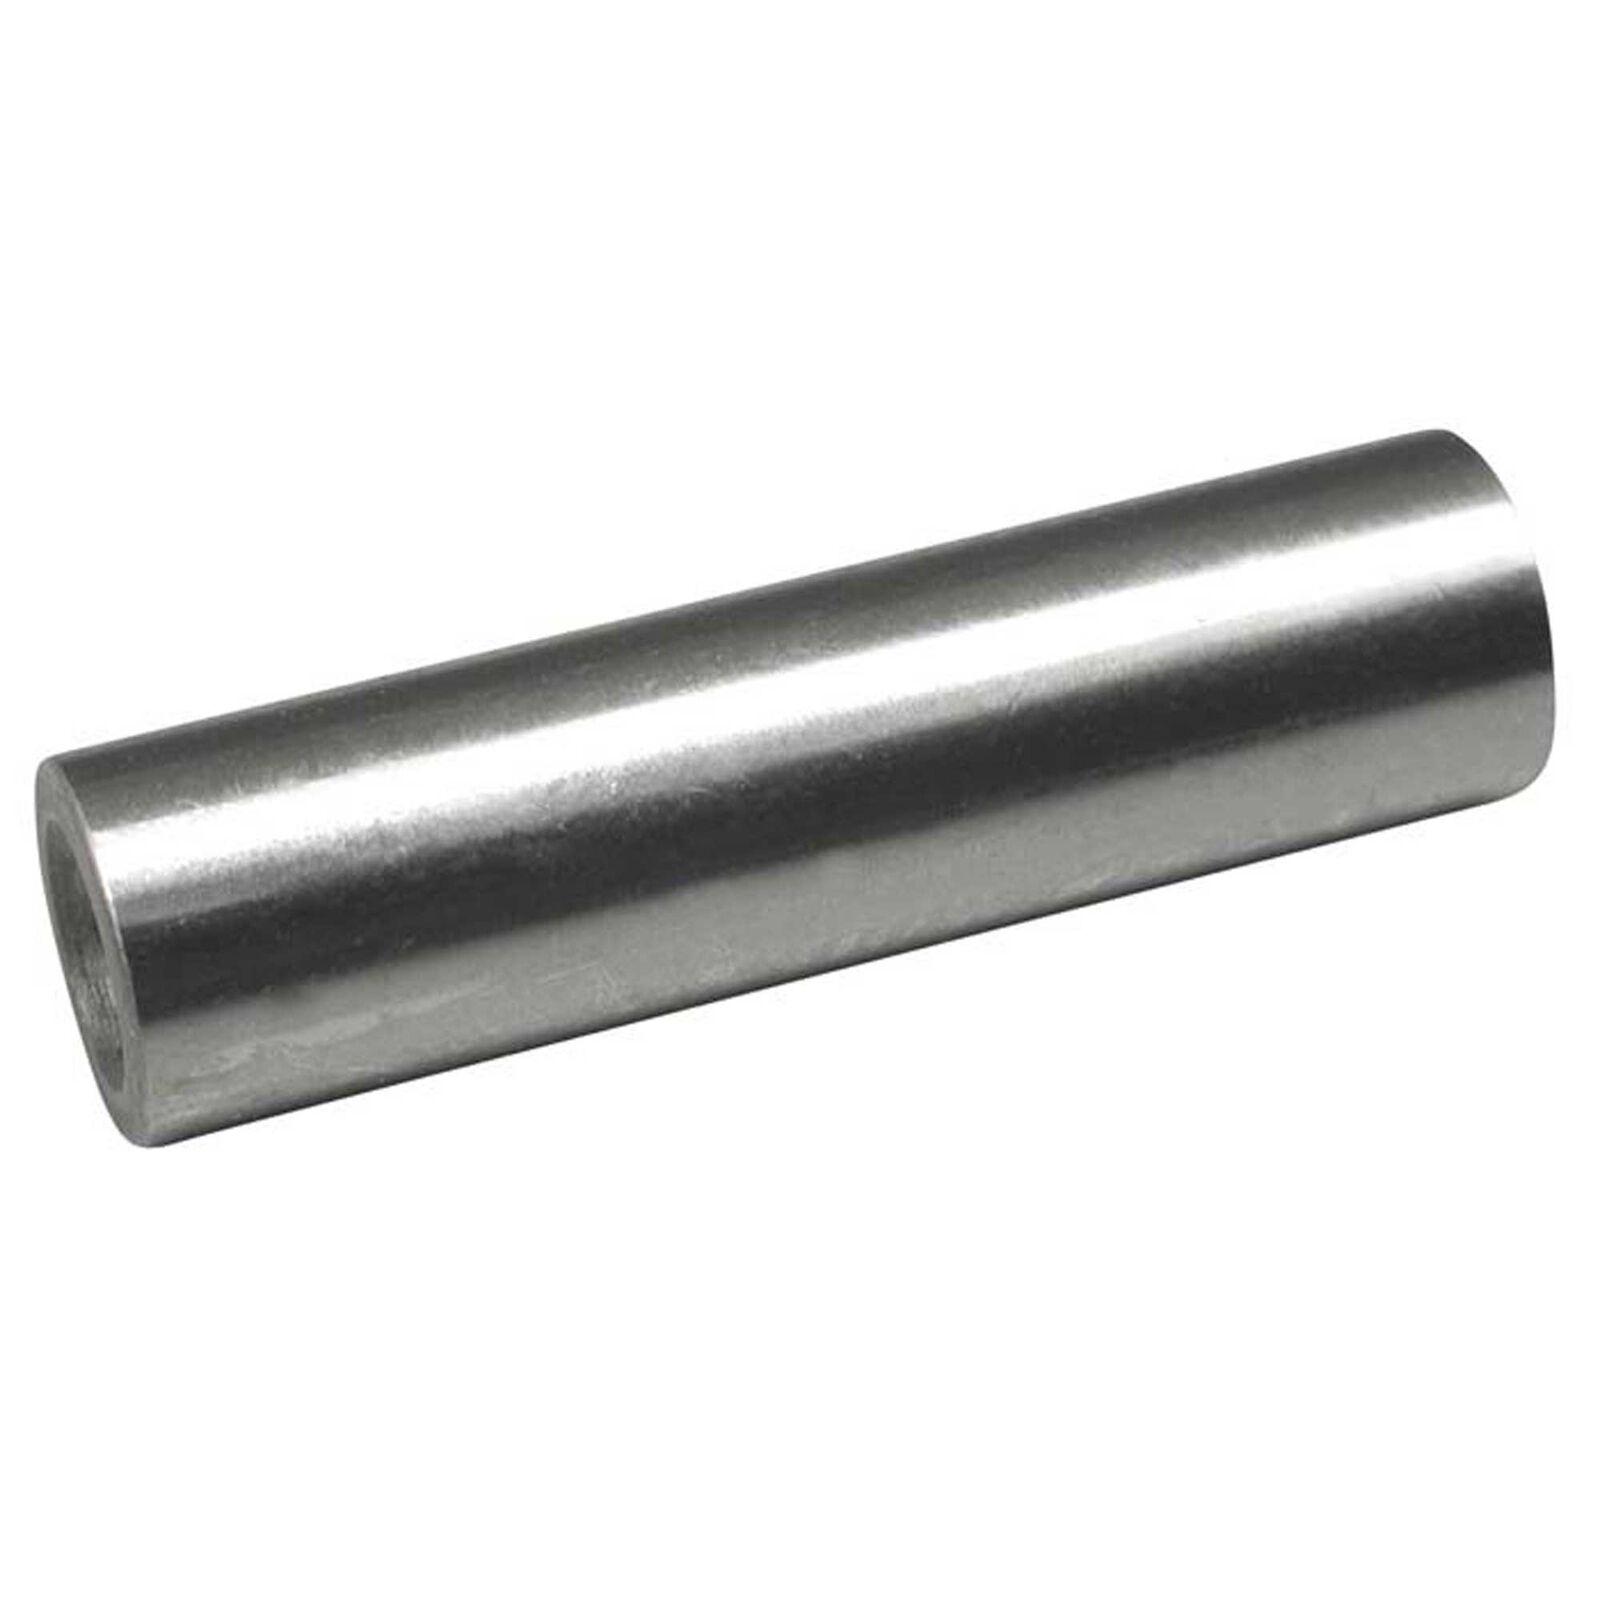 Piston Pin: 40 46VFR